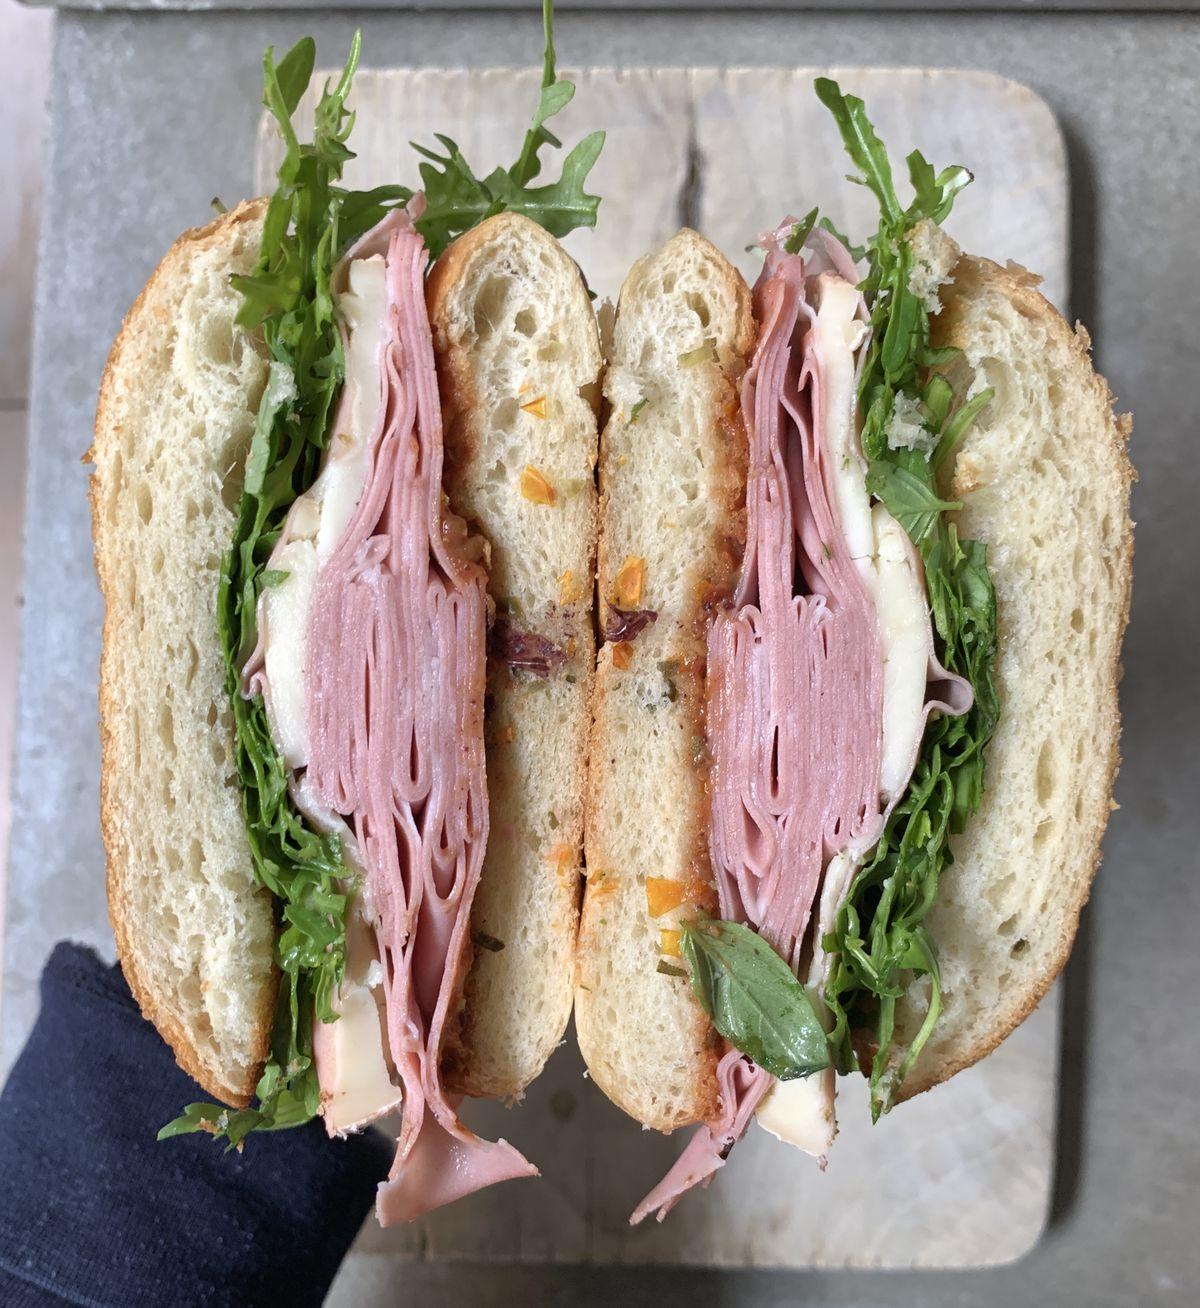 A mortadella and taleggio sandwich at new Coal Drops Yard restaurant Sons and Daughters